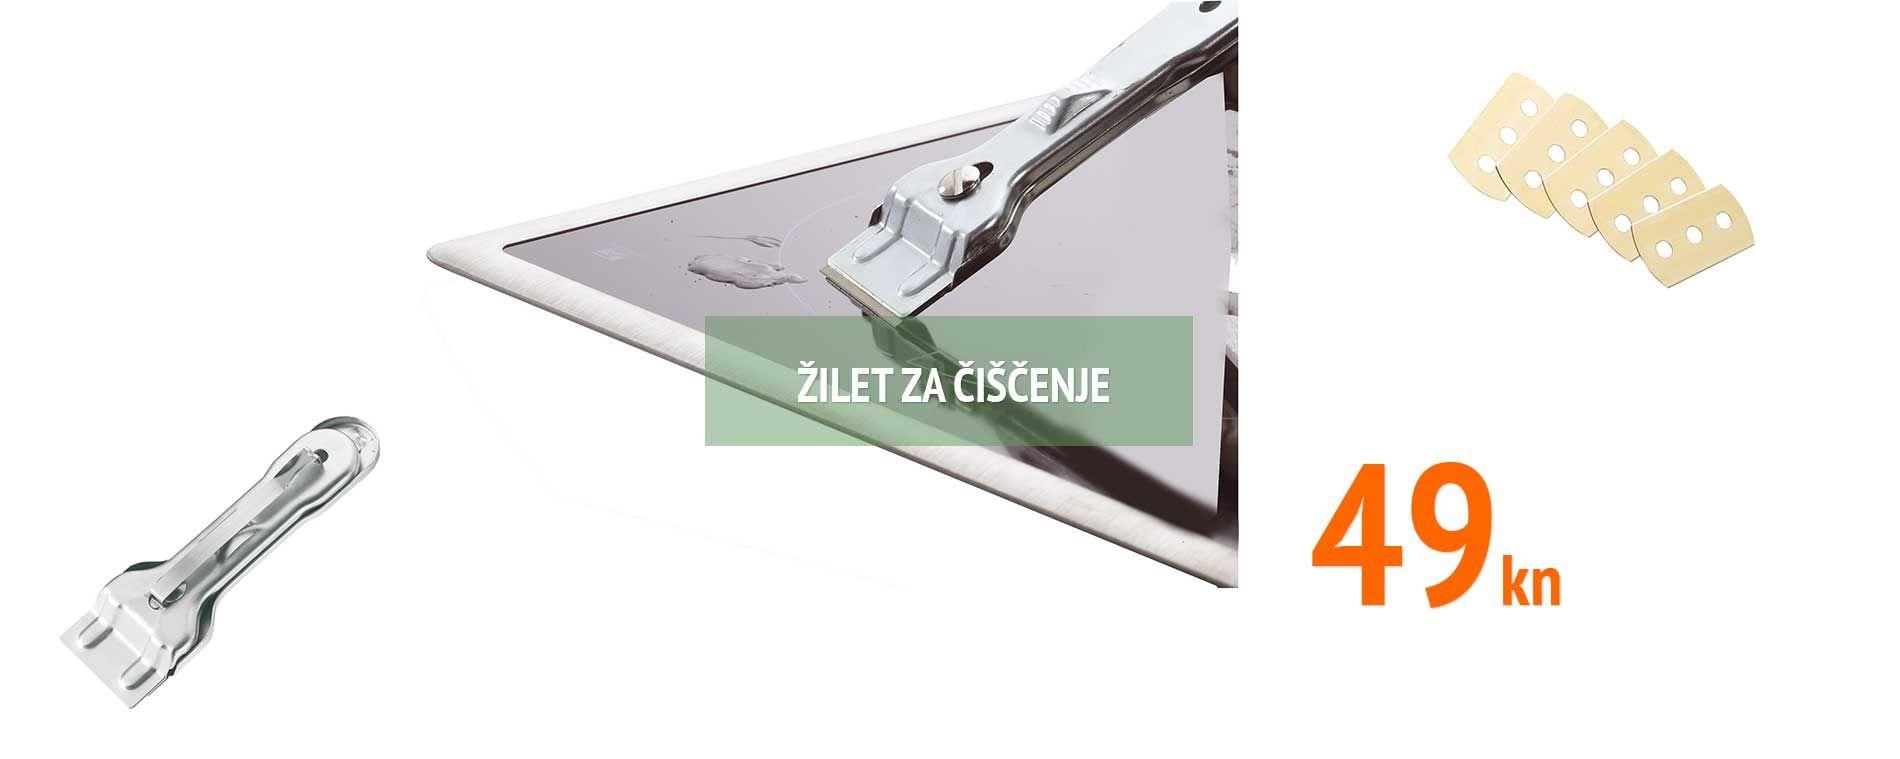 http://www.kuhinja.net/zilet-za-ciscenje-piccobello